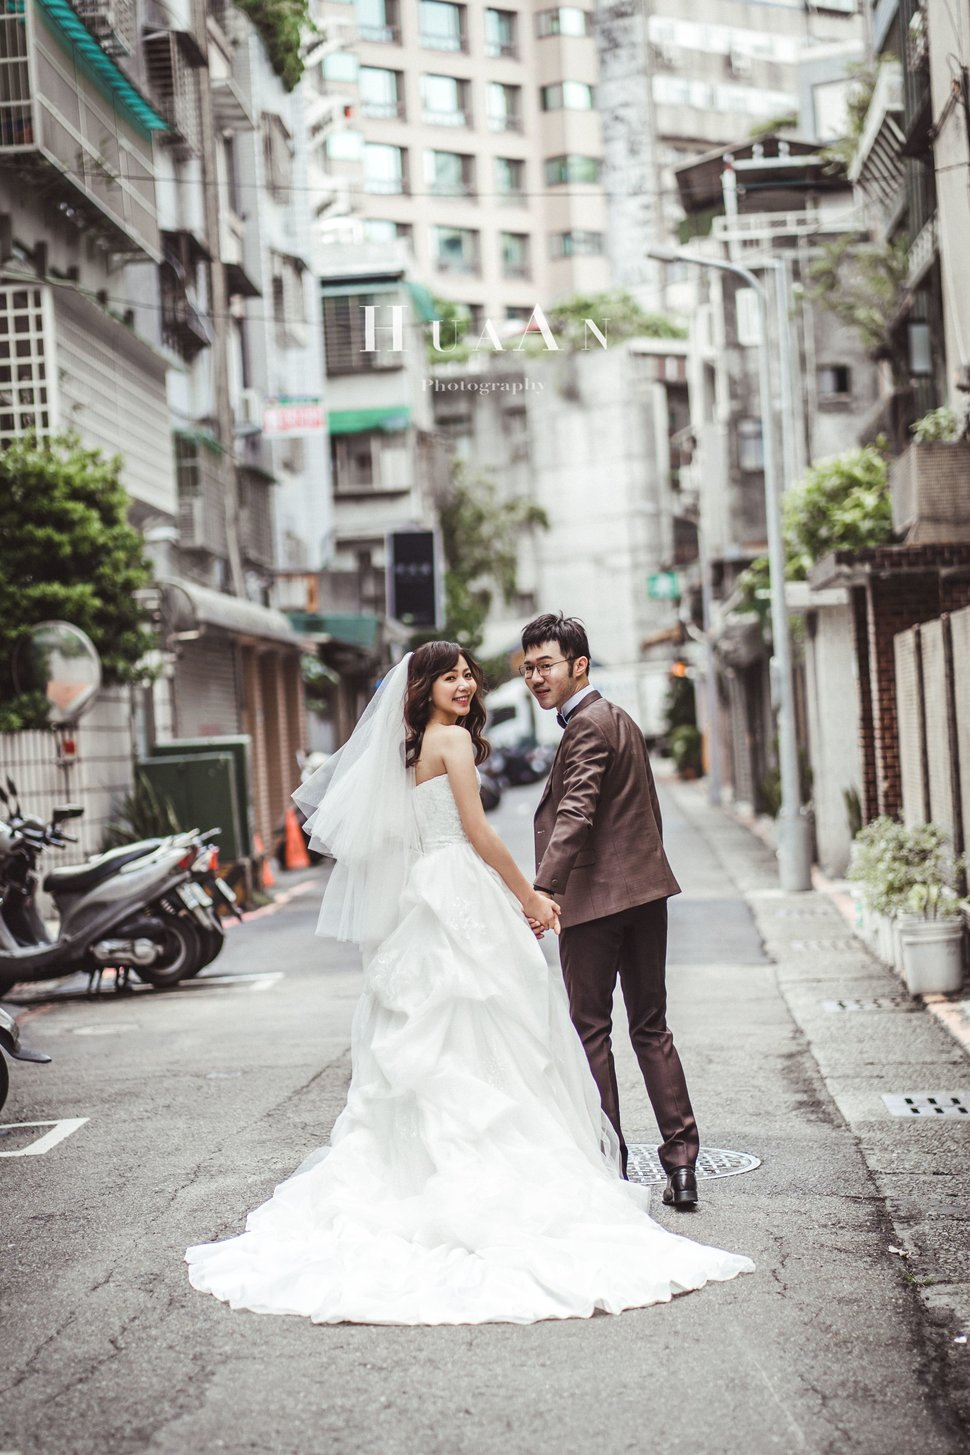 DSC01715 - Huaan Photography《結婚吧》